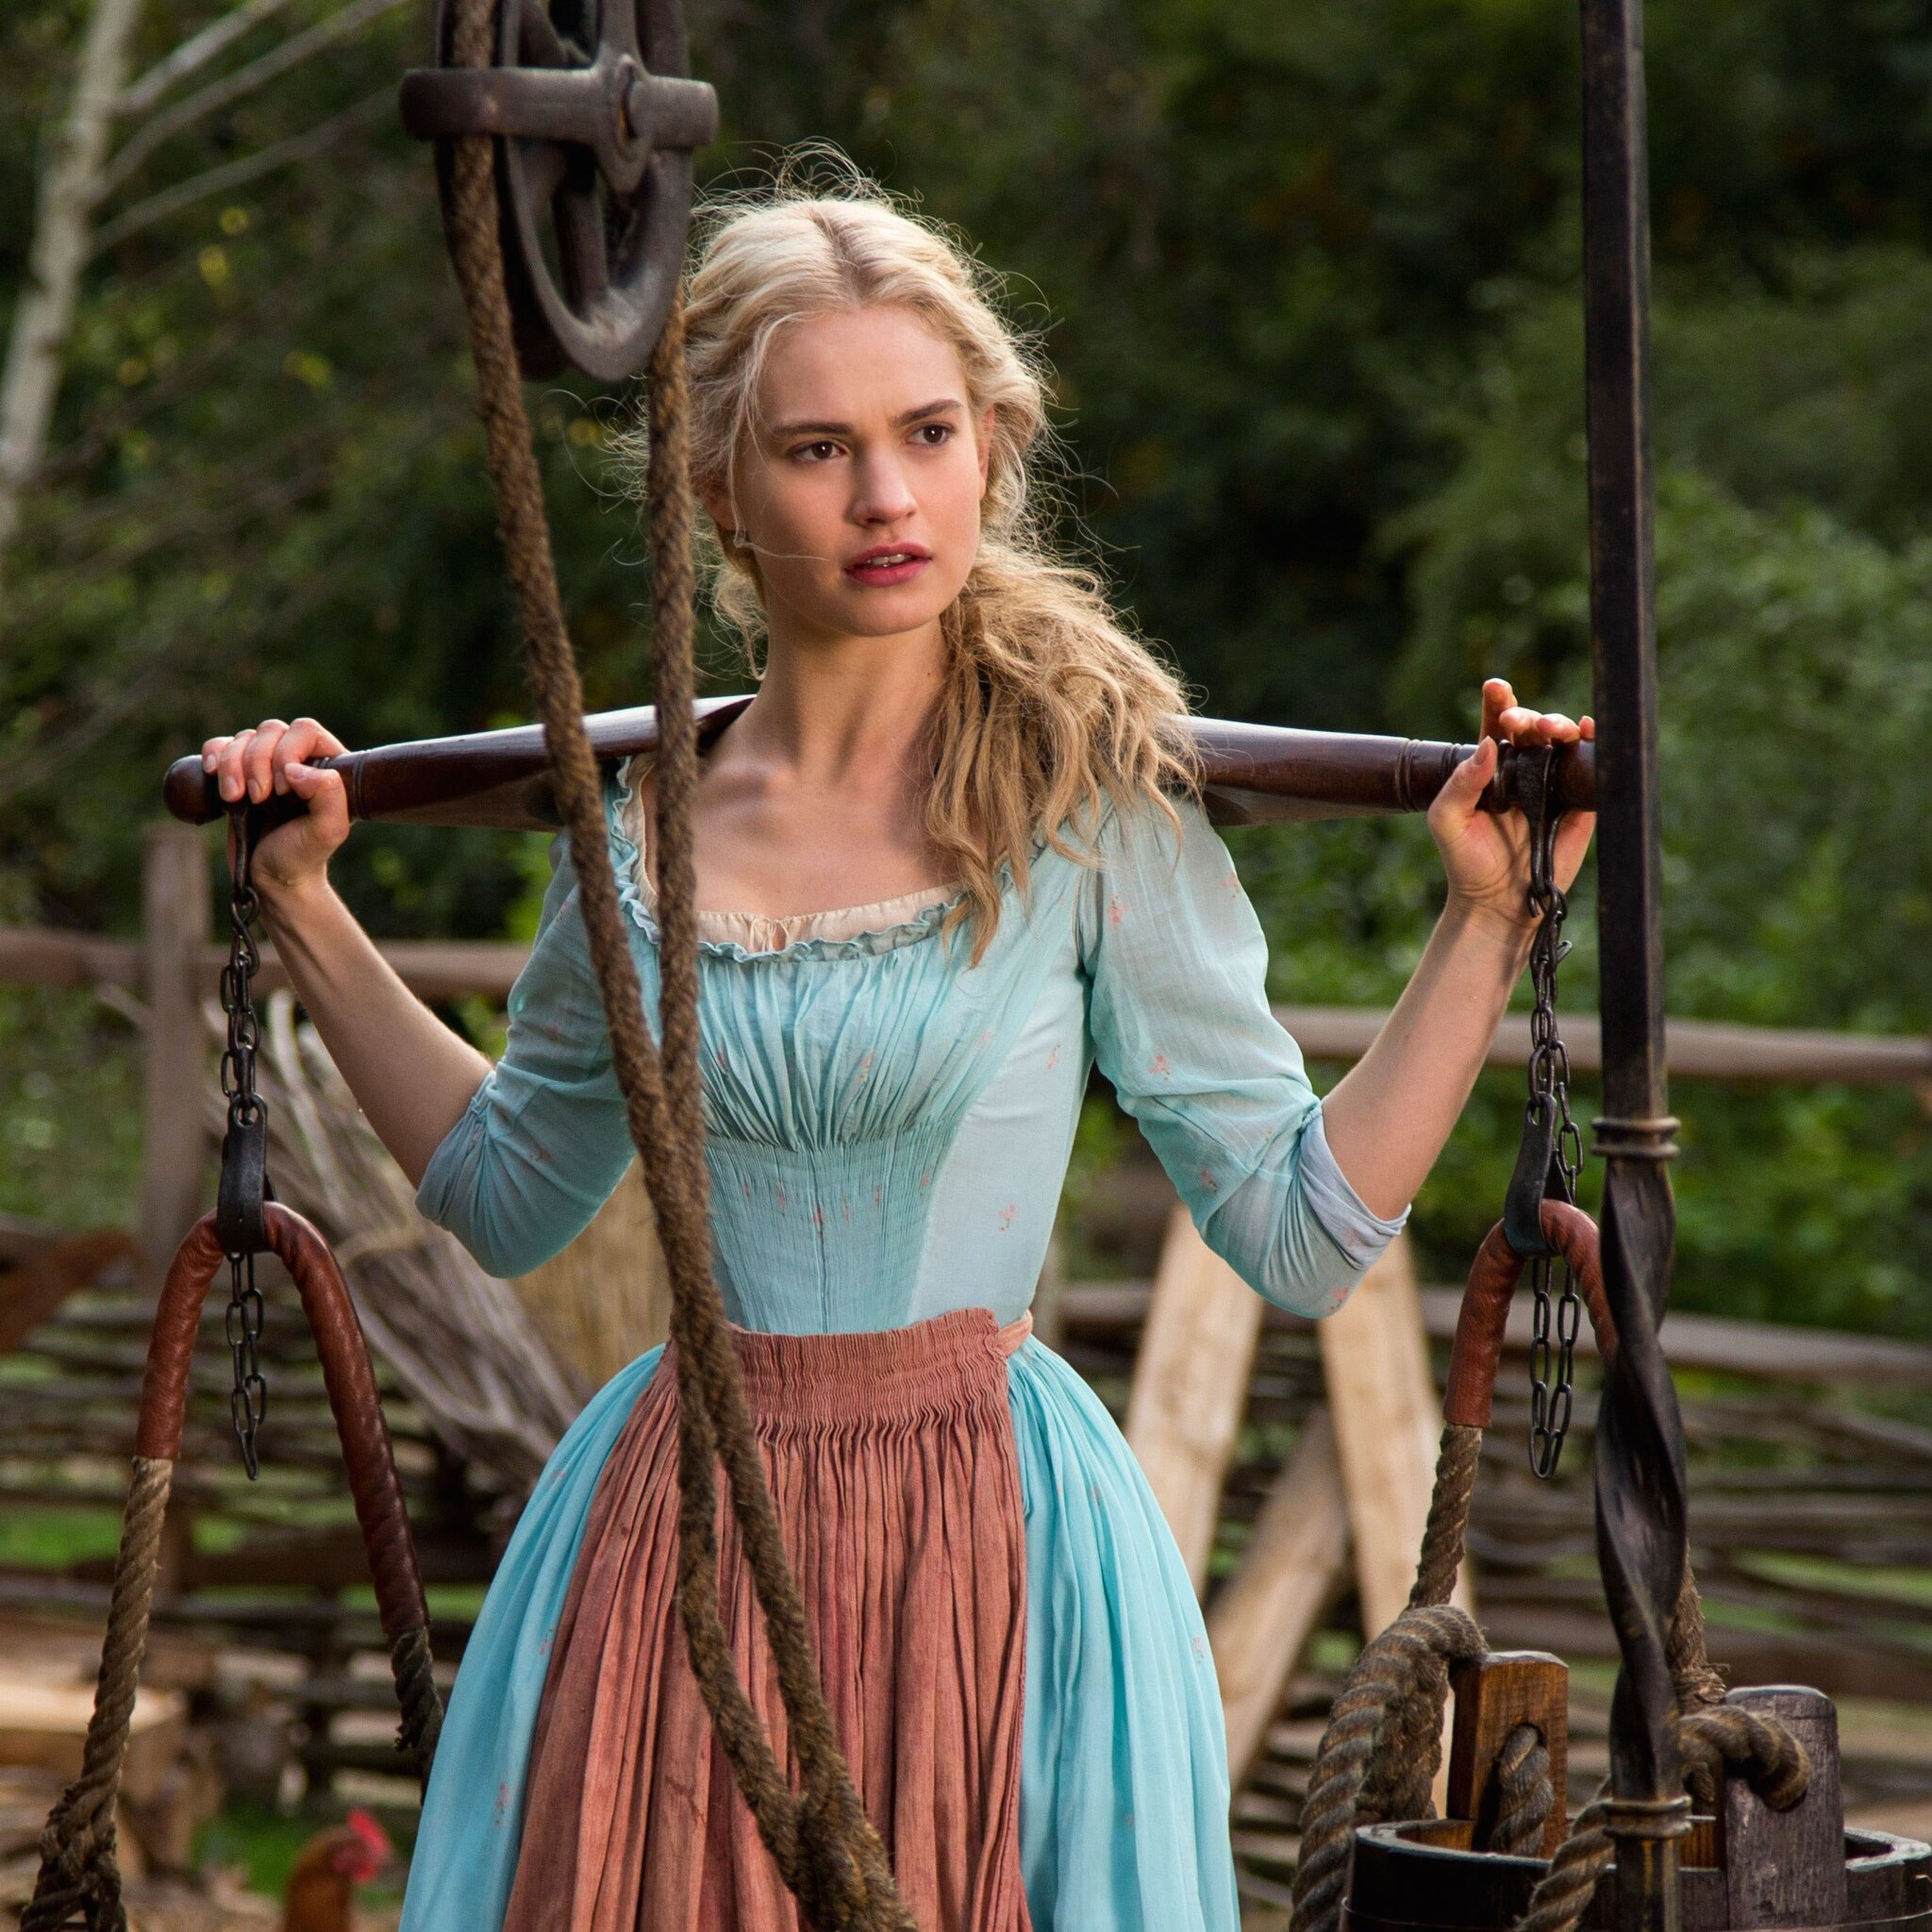 2048x2048 Lily James As Cinderella Ipad Air HD 4k